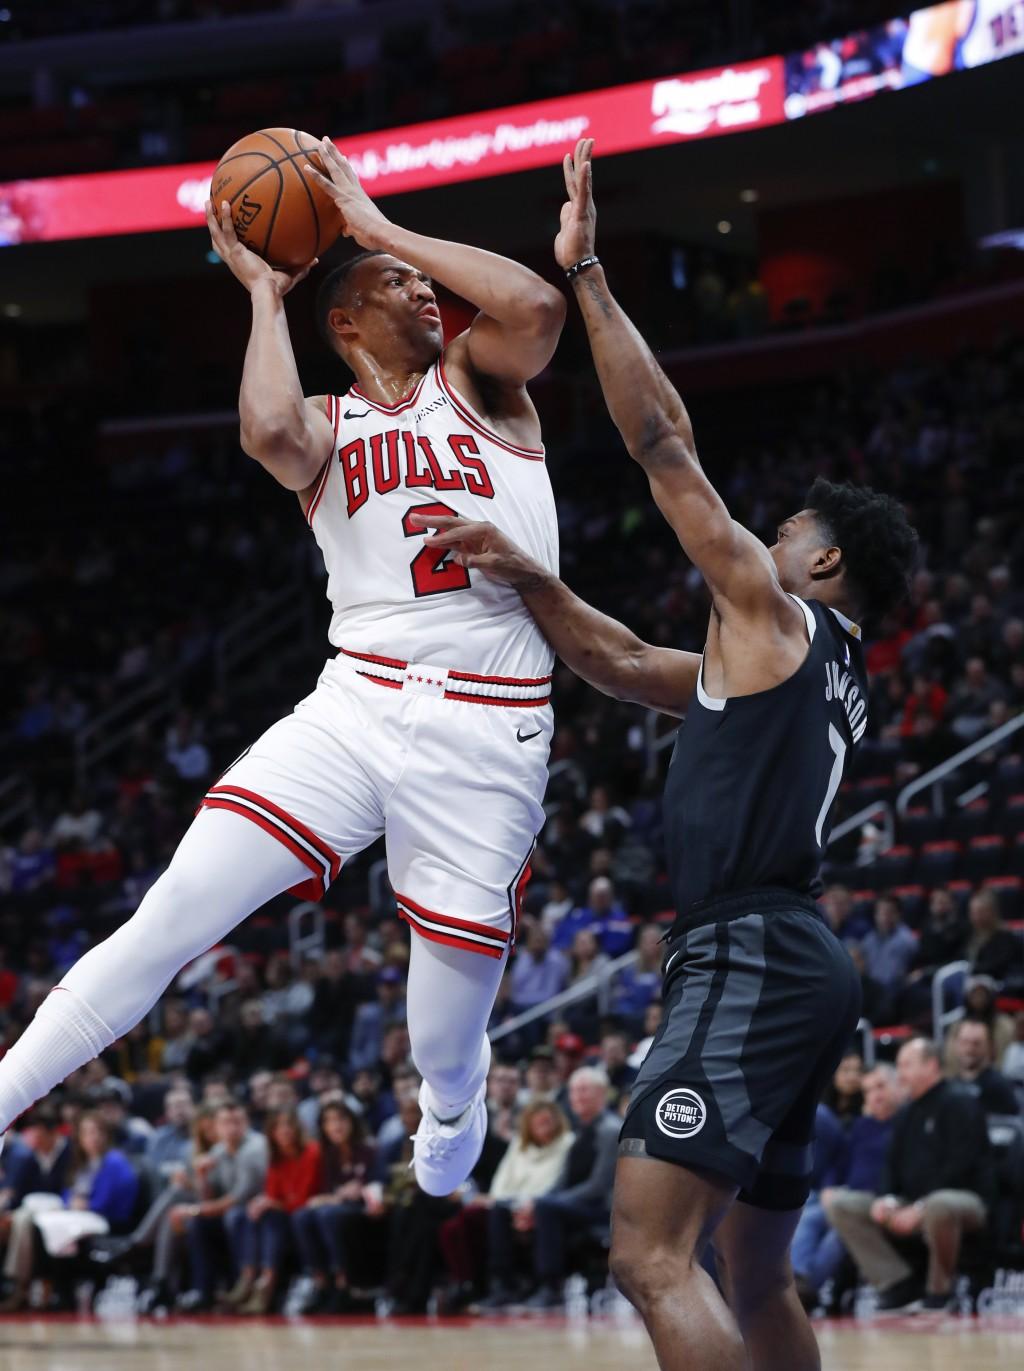 Chicago Bulls forward Jabari Parker (2) drives on Detroit Pistons forward Stanley Johnson (7) during the first half of an NBA basketball game in Detro